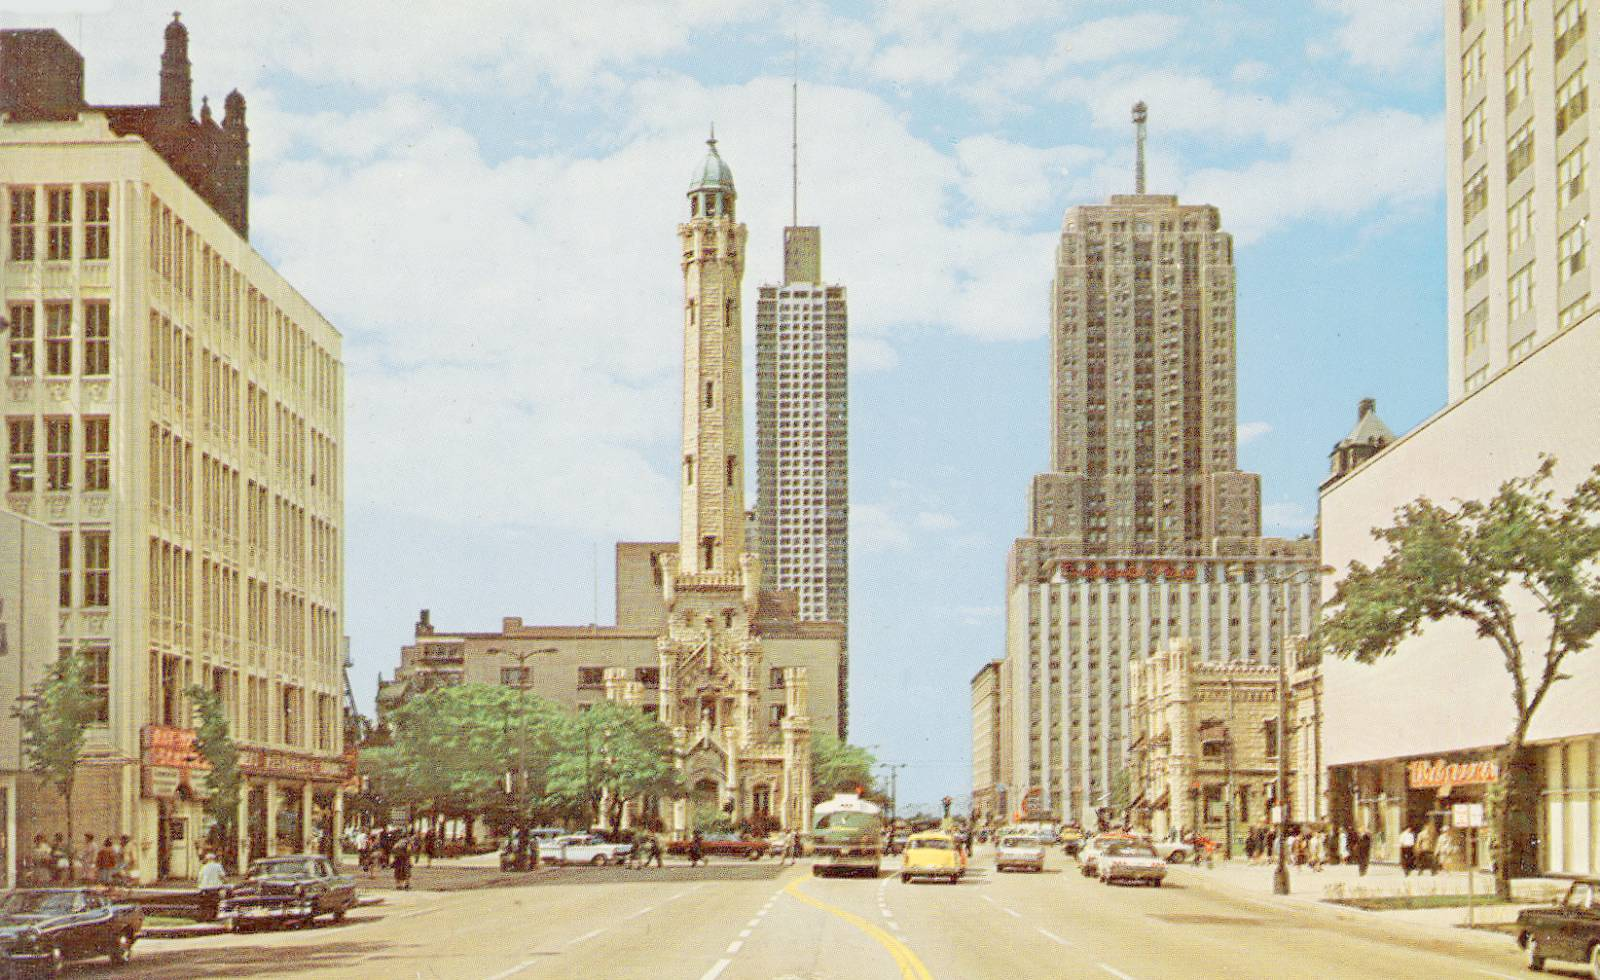 chuckman s collection chicago postcards volume 11 postcard